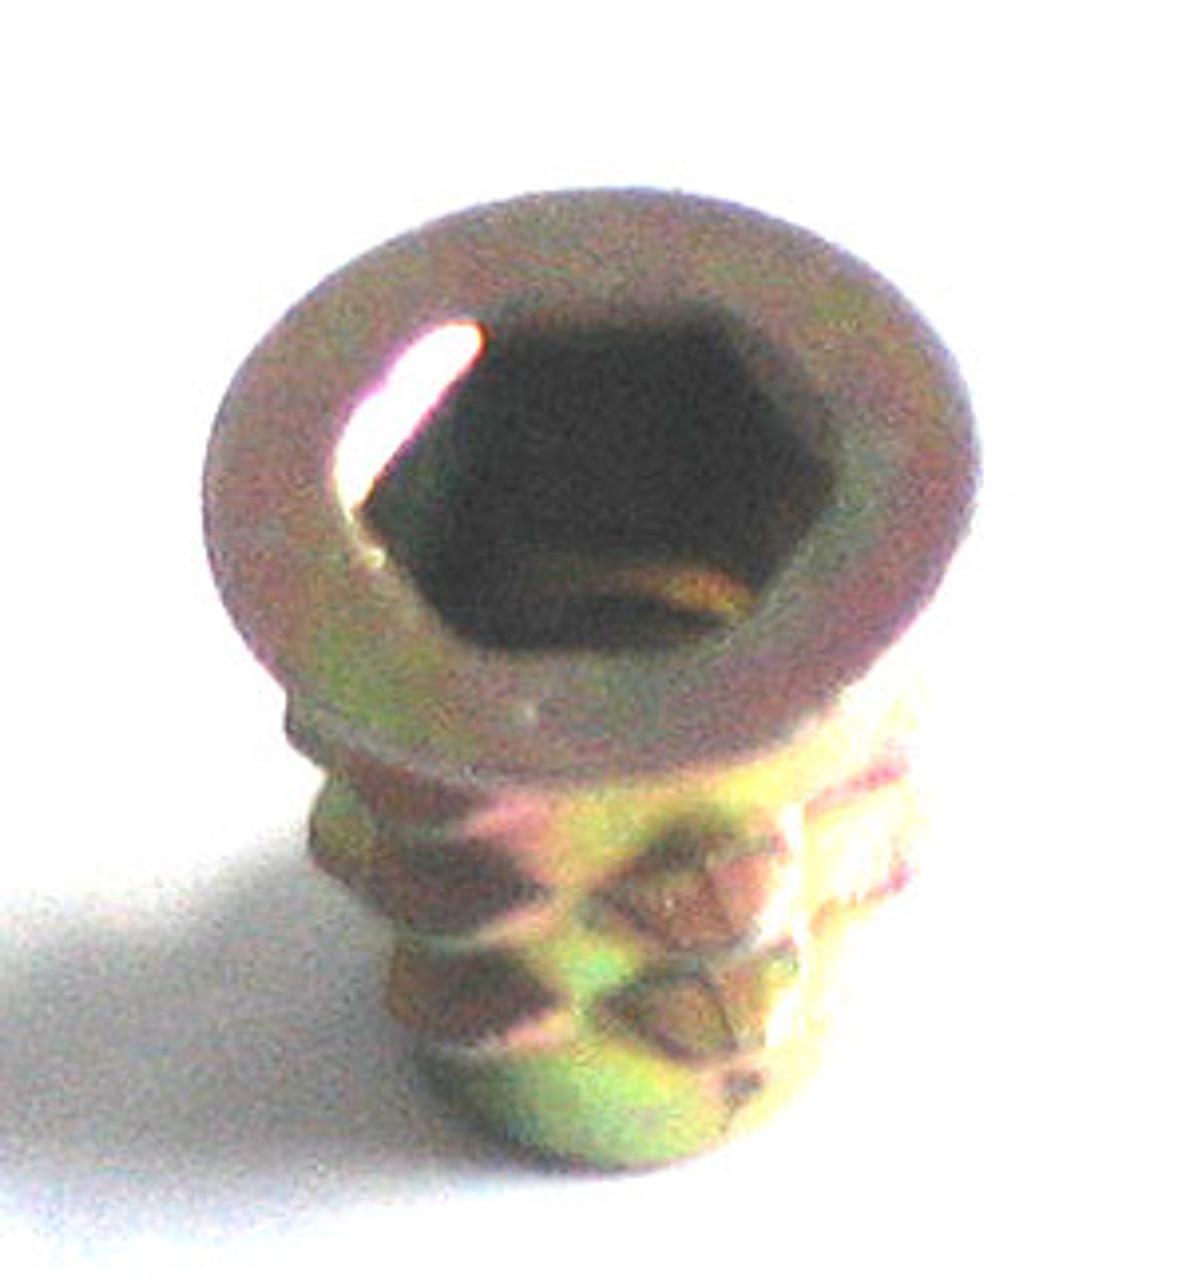 M6 6 mm DIE CAST ZINC ALLOY FLANGED HEXDRIVE THREAD INSERT